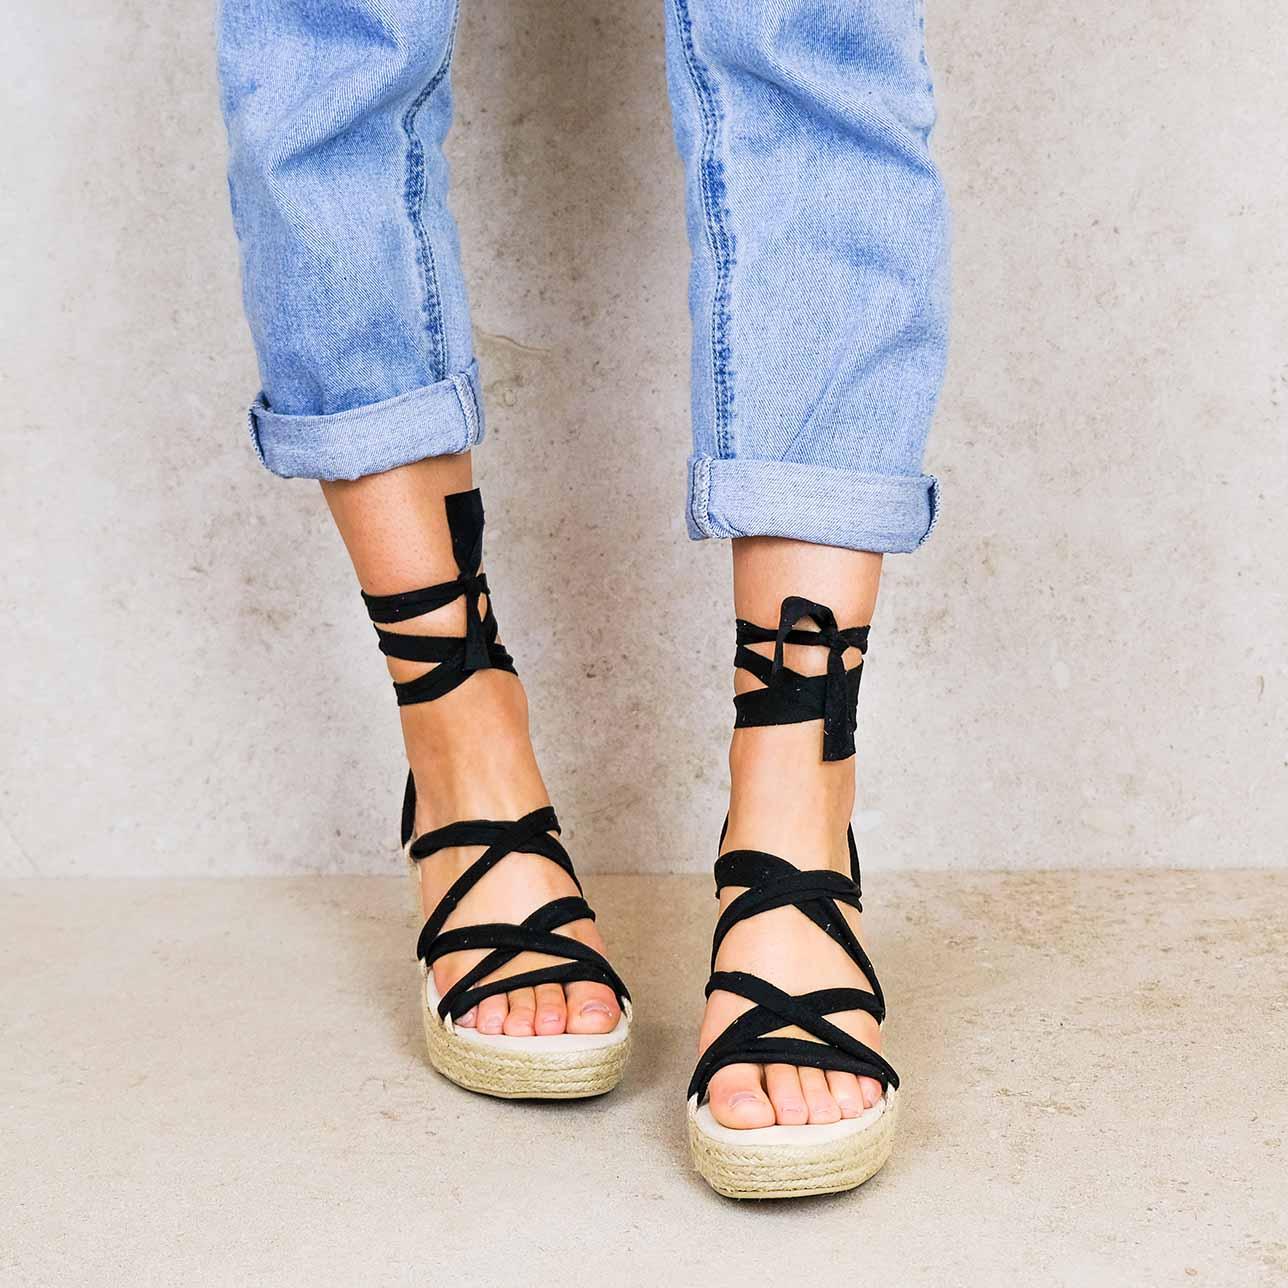 Chilon-jute-2_lintsandalen sandals travelsandals vegan sustainable sandals wikkelsandalen